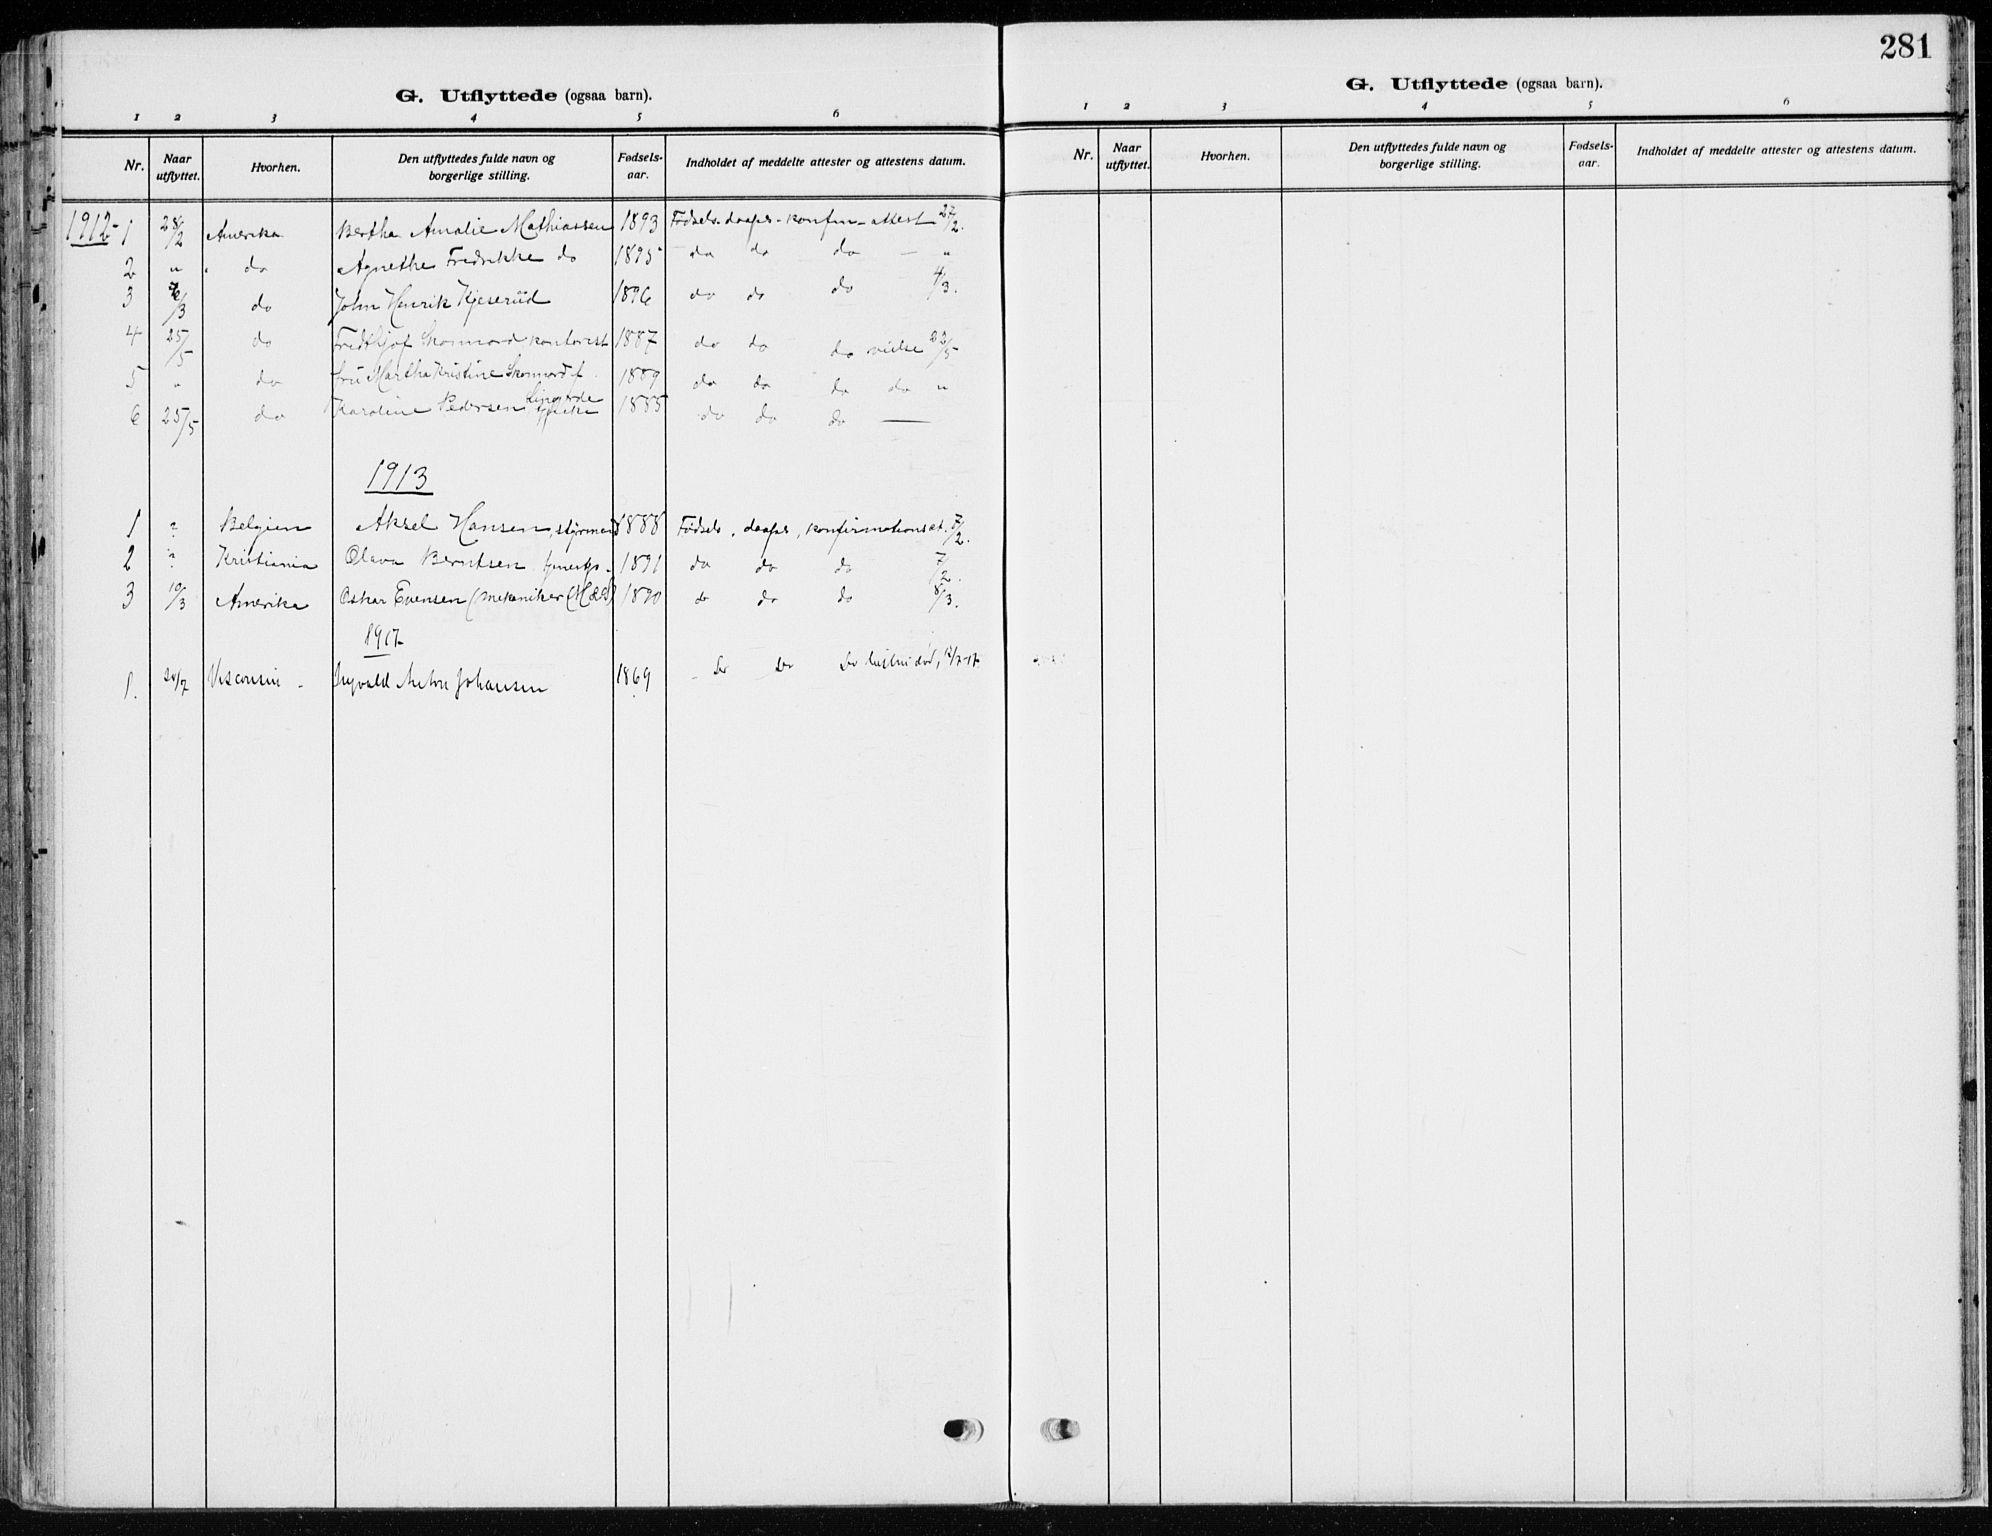 SAH, Vardal prestekontor, H/Ha/Haa/L0014: Ministerialbok nr. 14, 1912-1922, s. 281